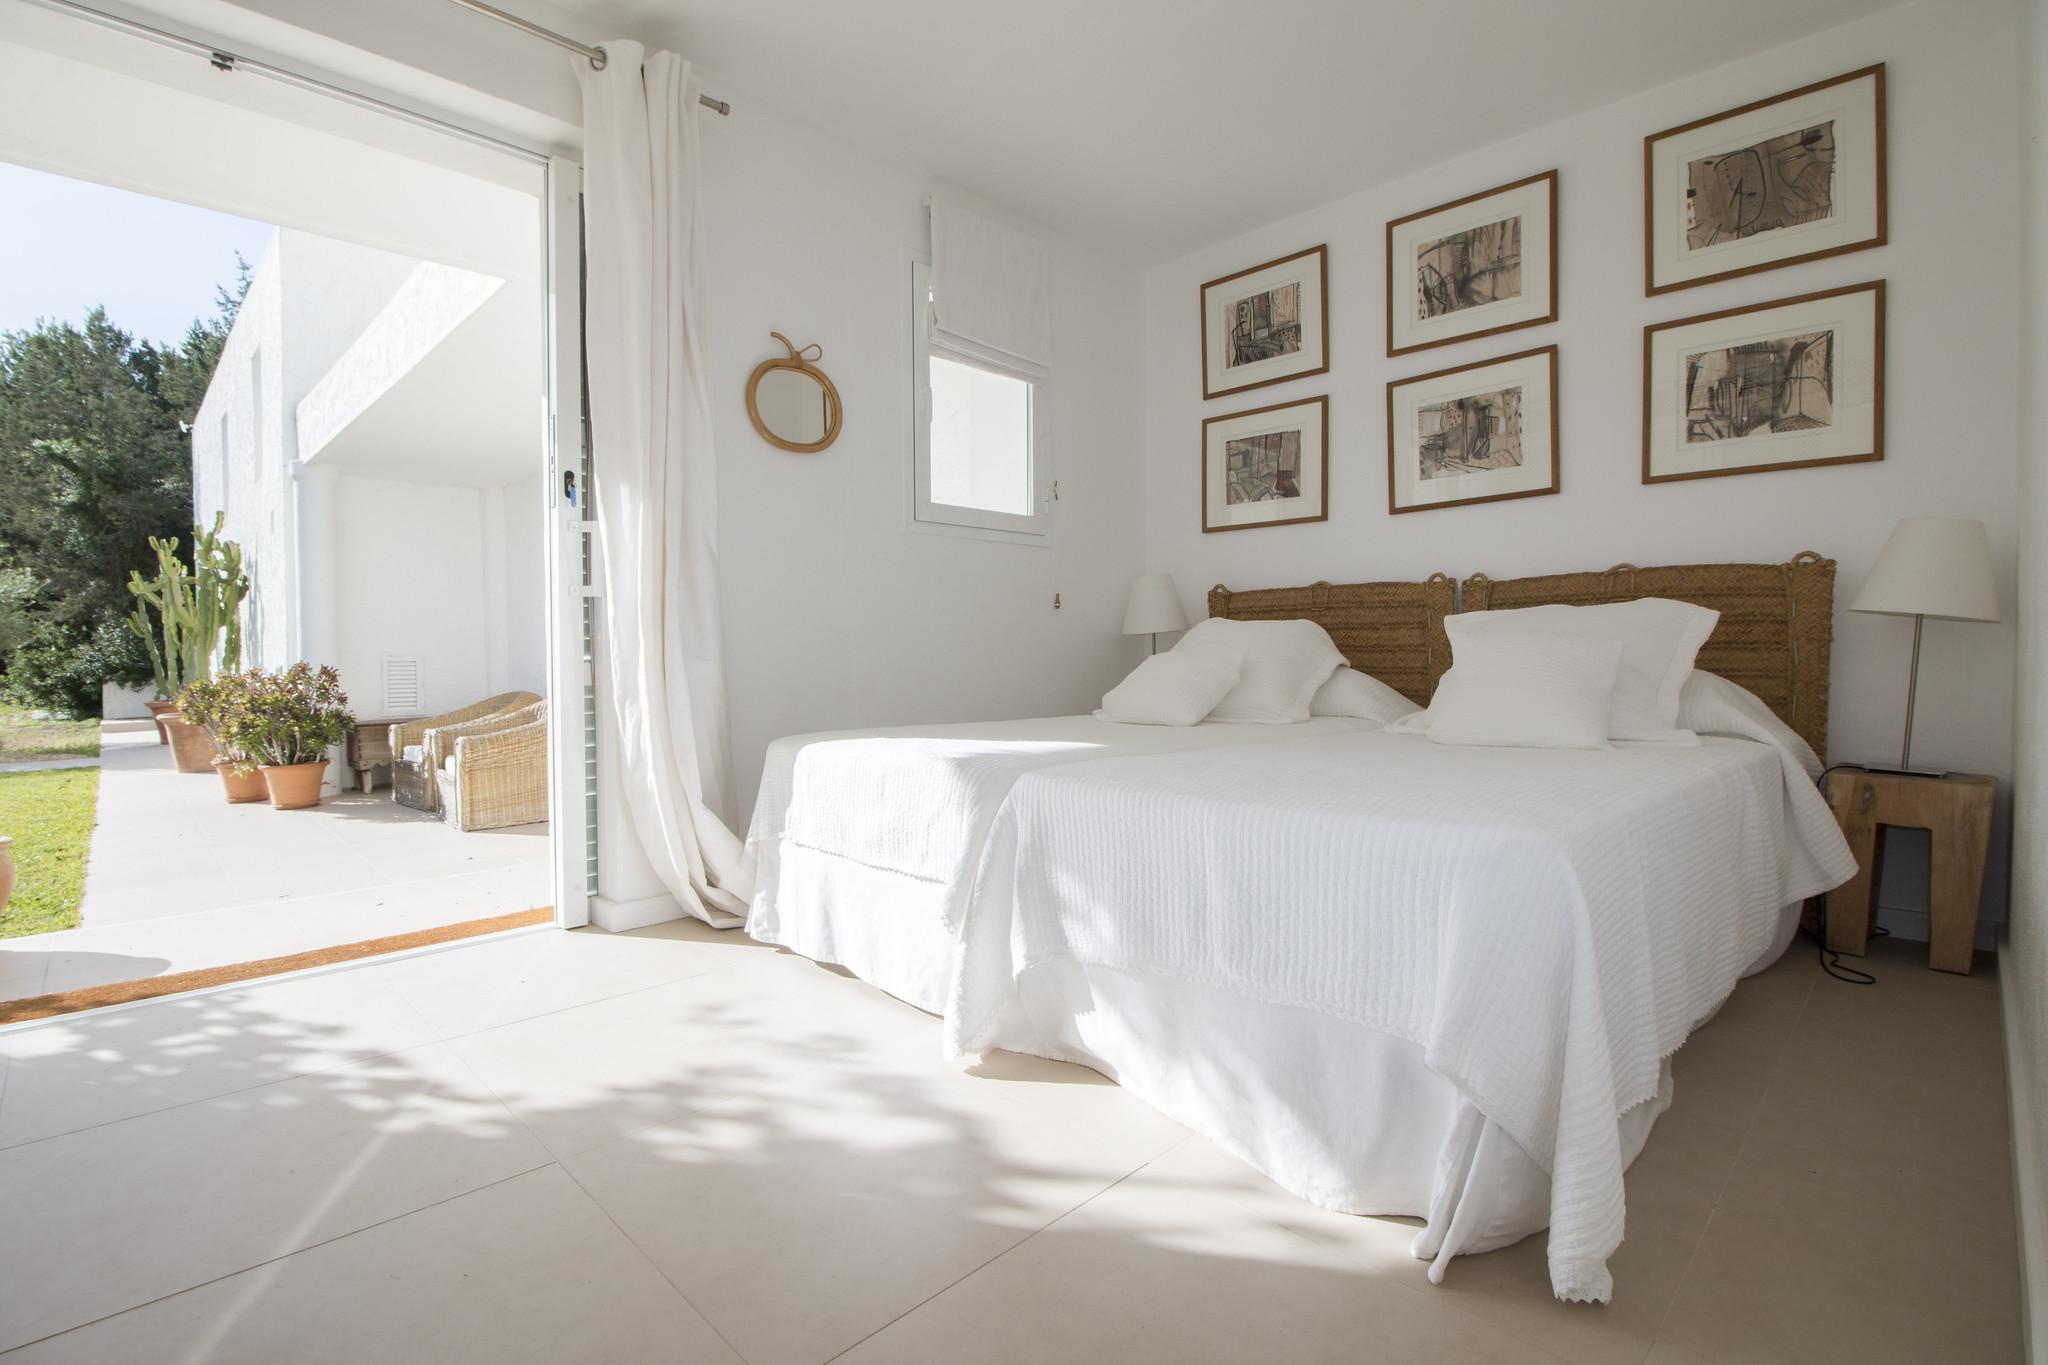 https://www.white-ibiza.com/wp-content/uploads/2020/06/white-ibiza-villas-casa-odette-interior-bedroom.jpg